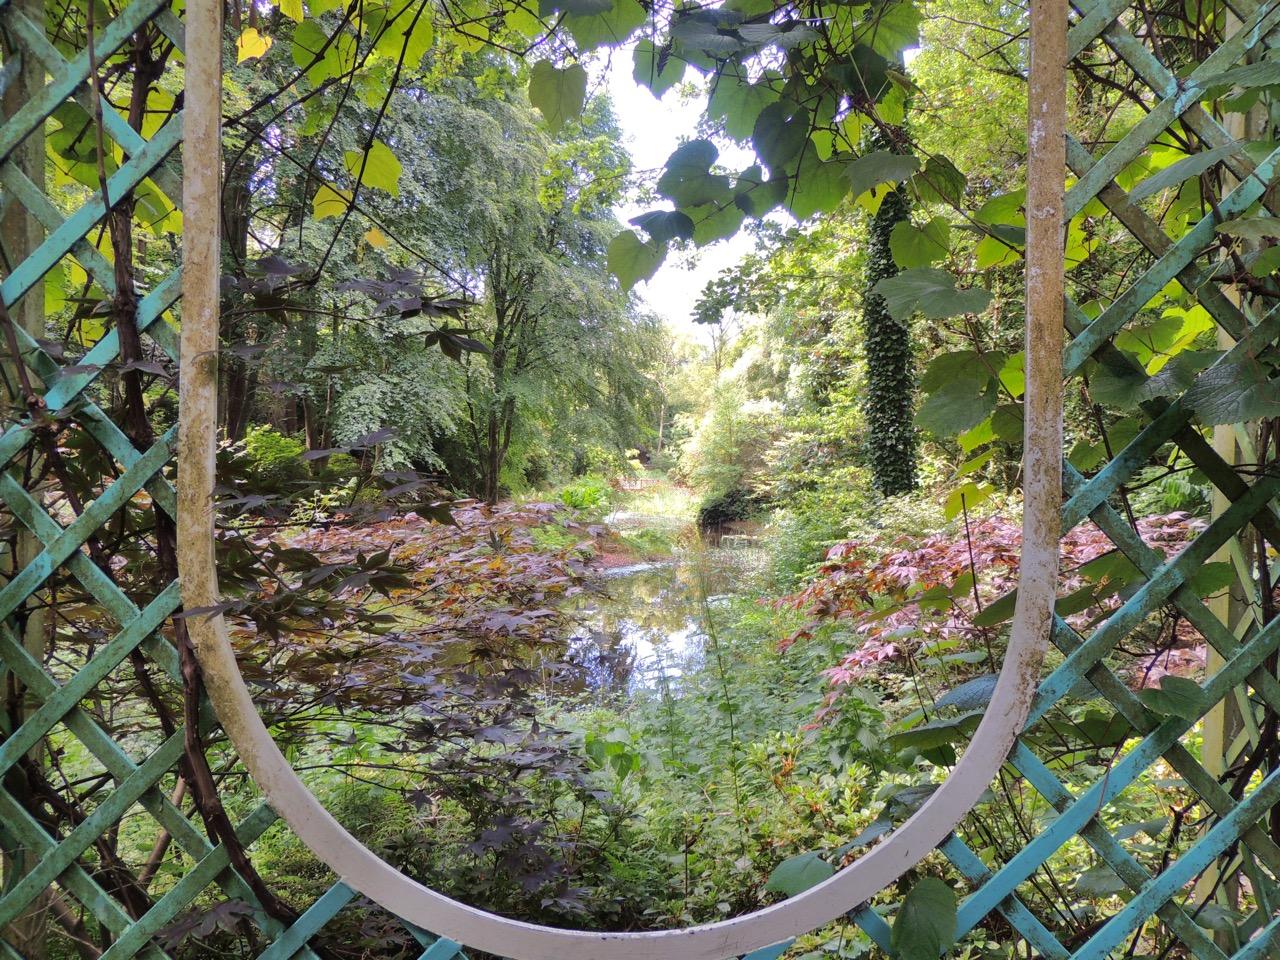 The Japanese Garden at Portmeirion